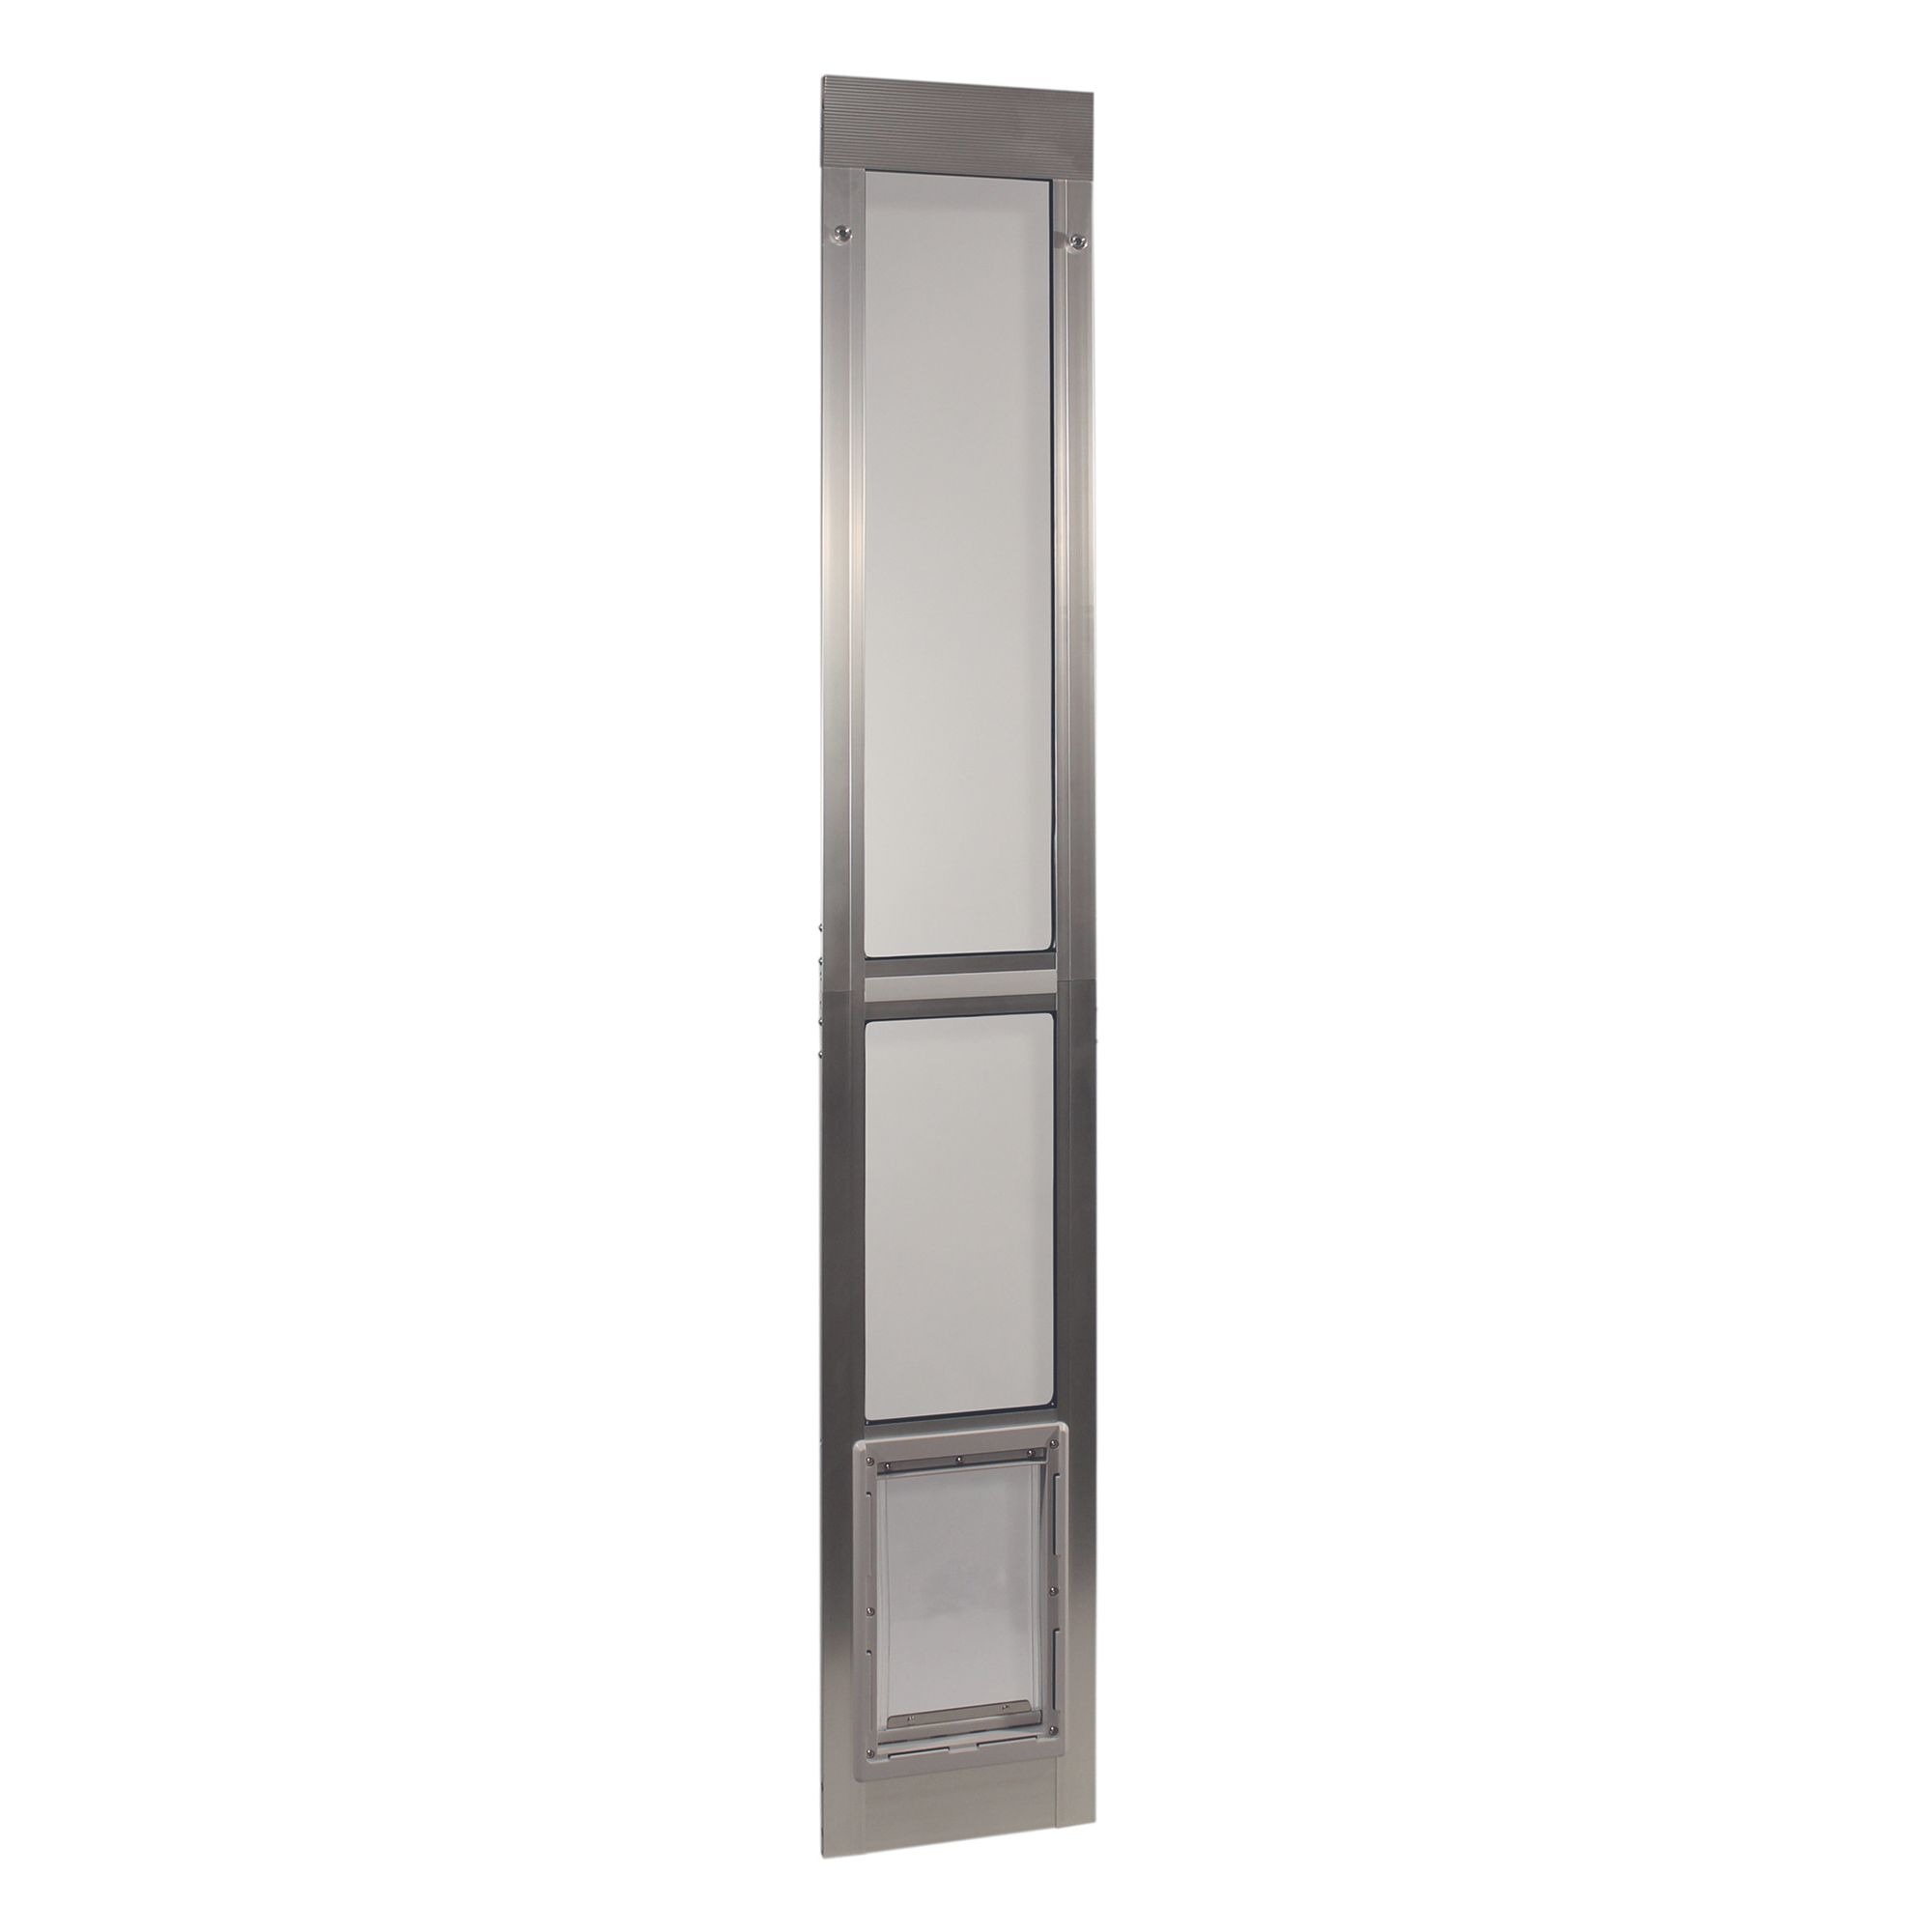 Ideal Pet Products Modular Patio Pet Door Size Medium White